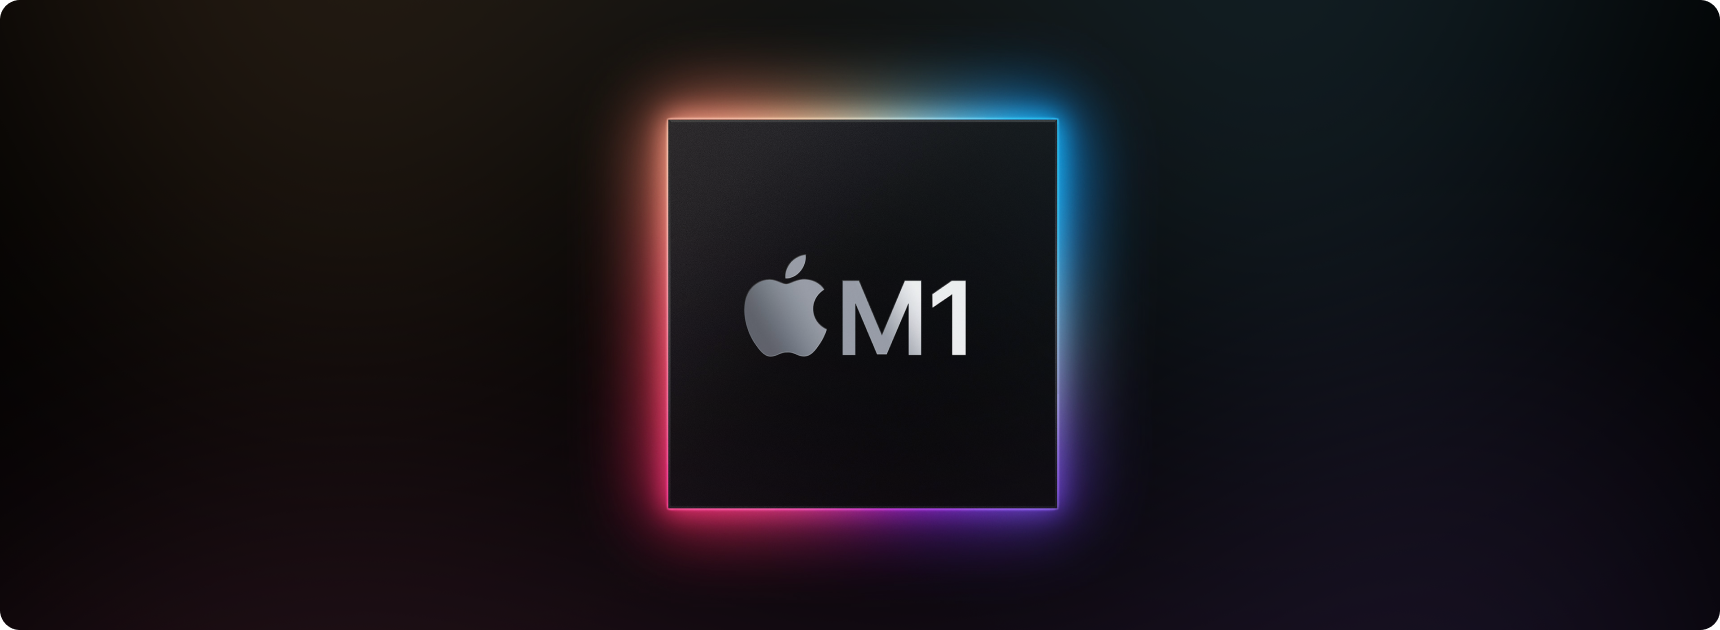 M1-04